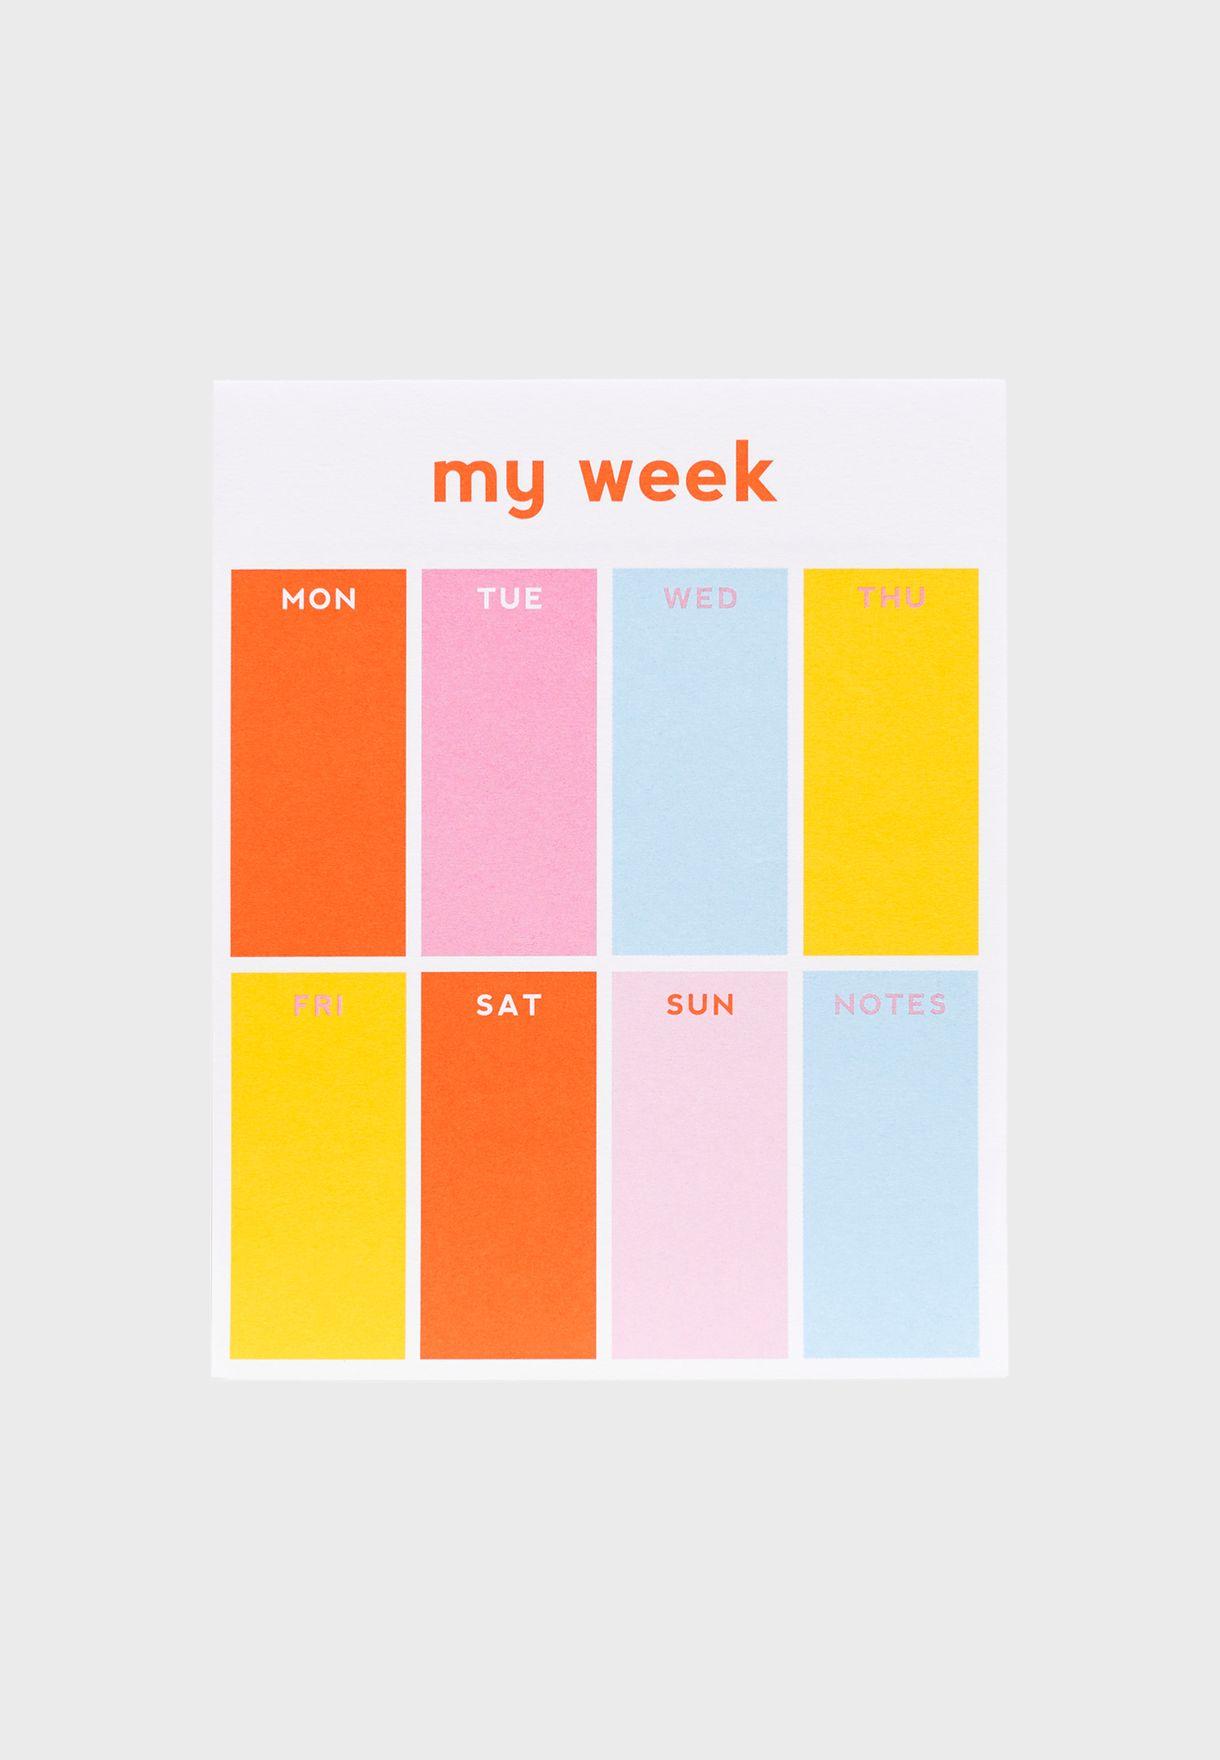 دفتر تخطيط اسبوعي صغير